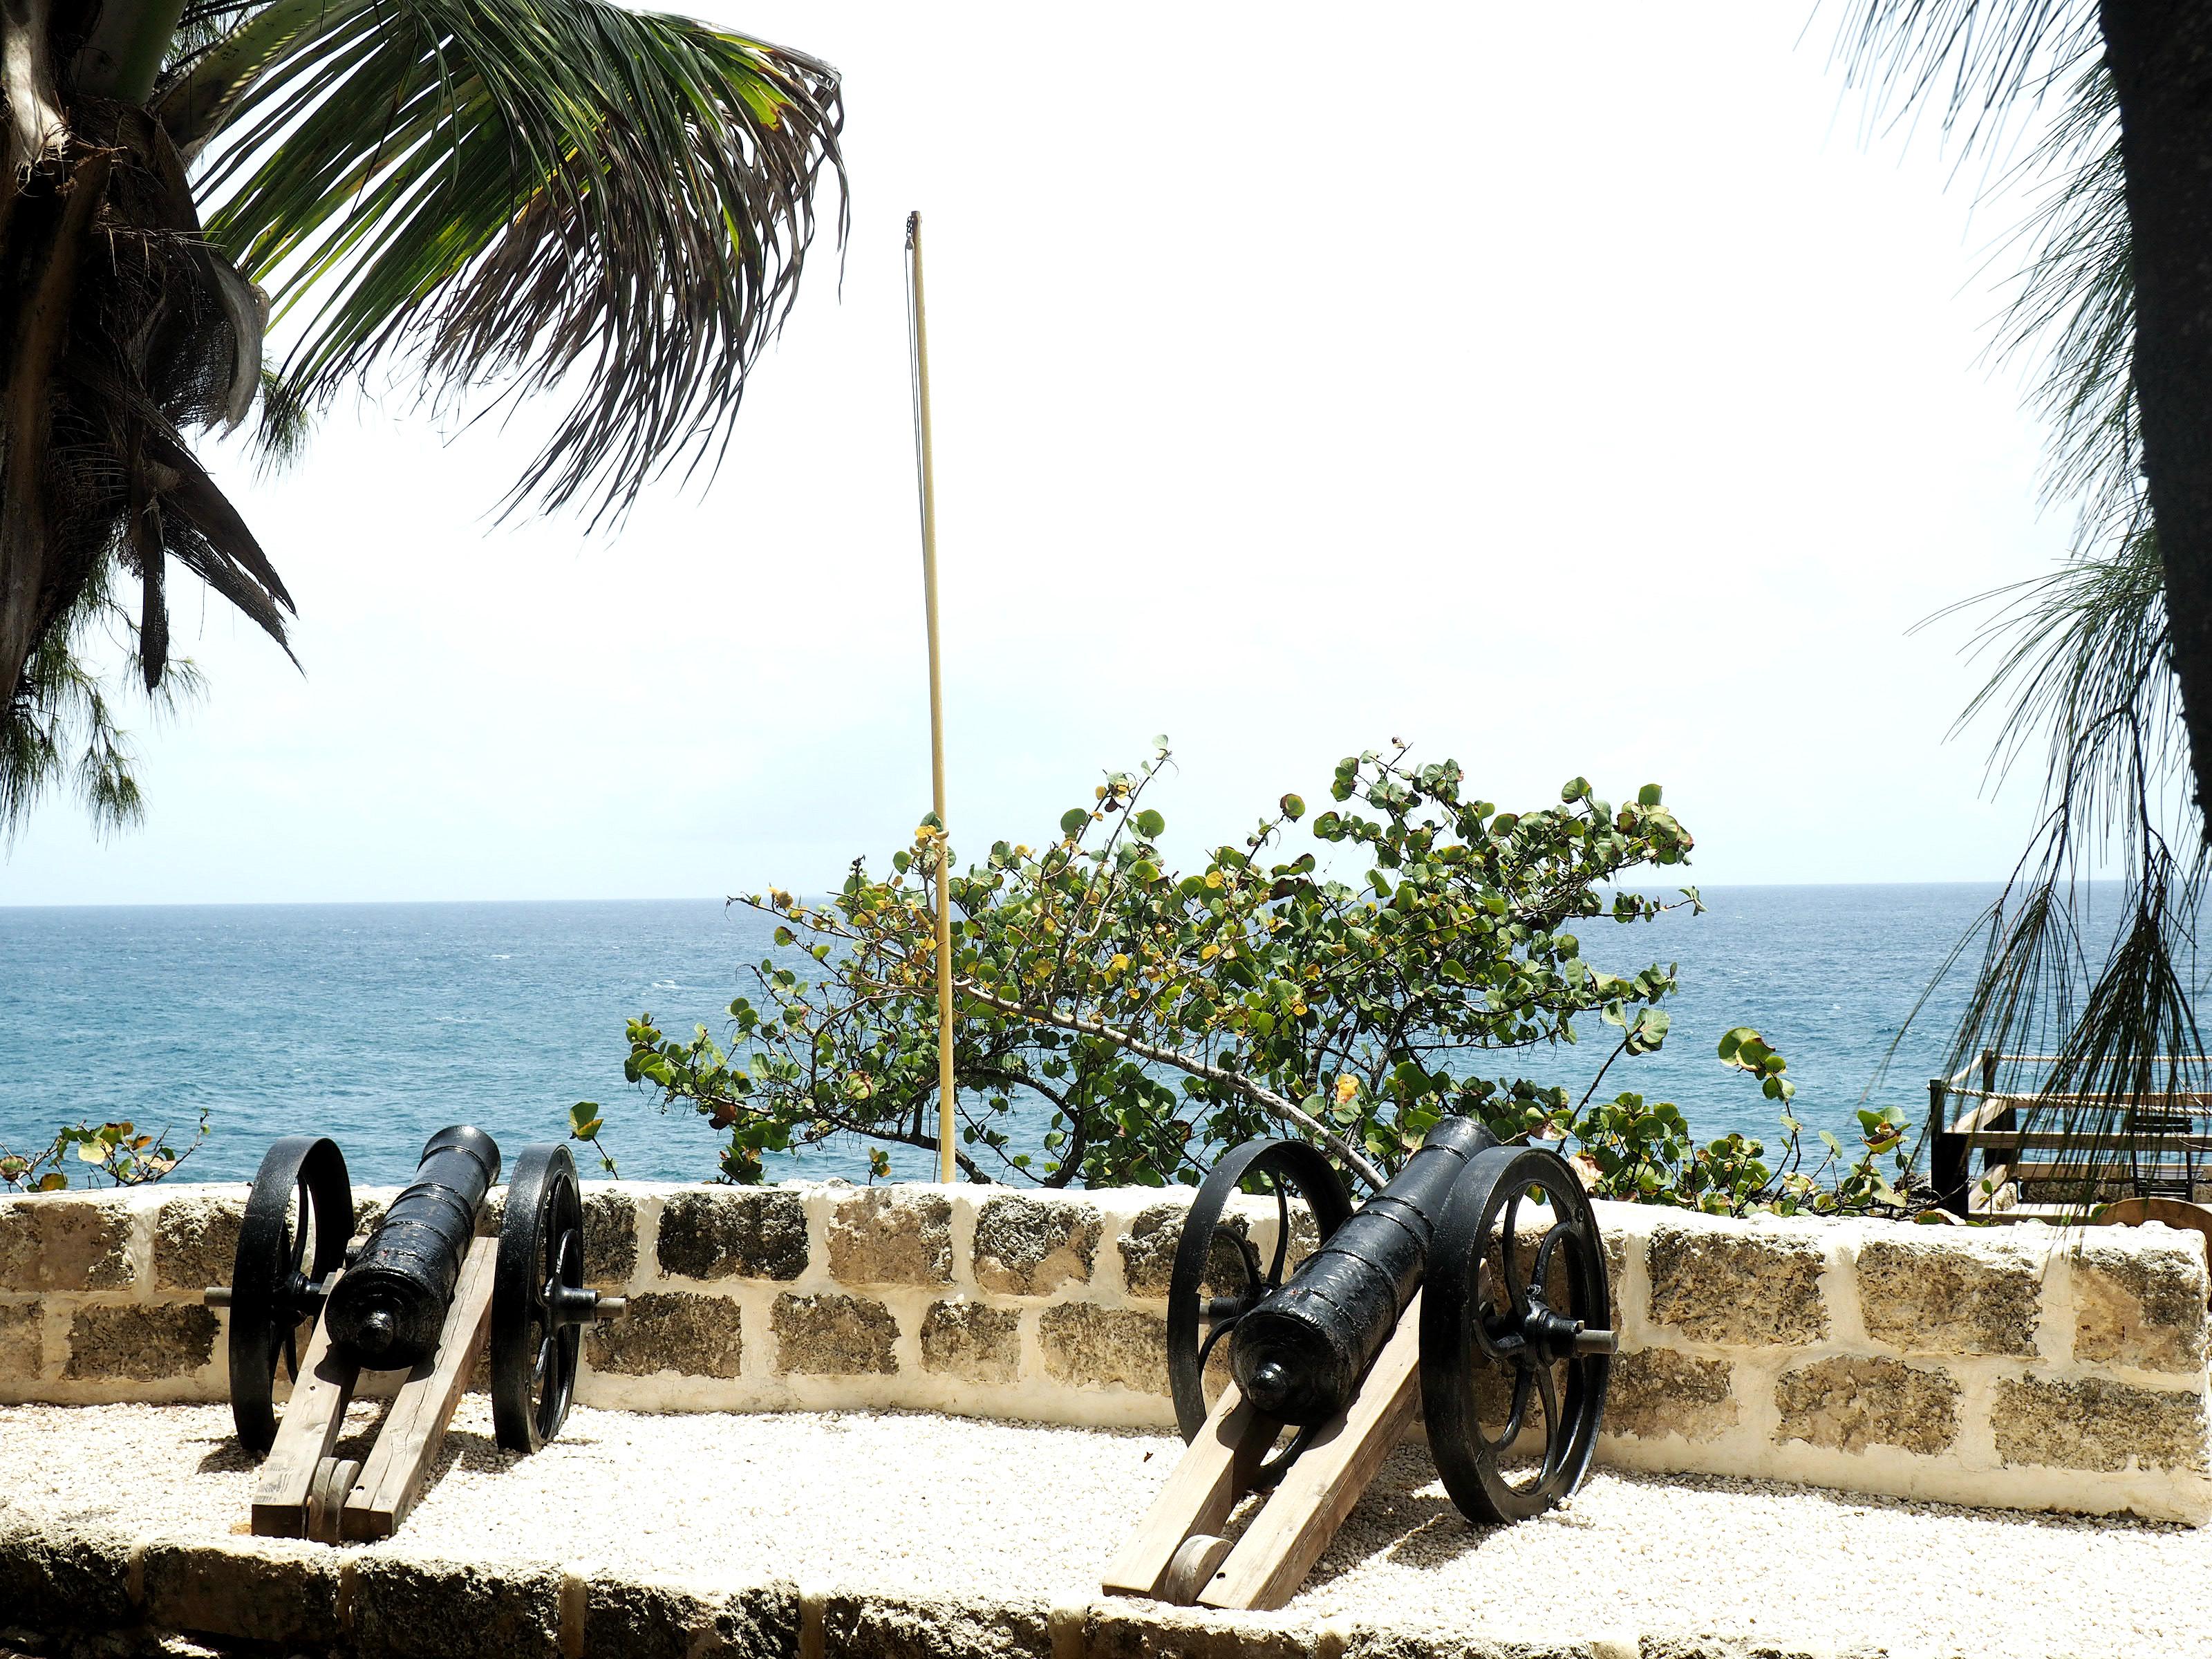 Tommeezjerry-Männerblog-Berlinblog-Fashionblog-Styleblog-Travelblog-Travel-Reiseblog-Reisen-Barbados-Karibik-Carribean-Summer-Sommer-Vacation-21